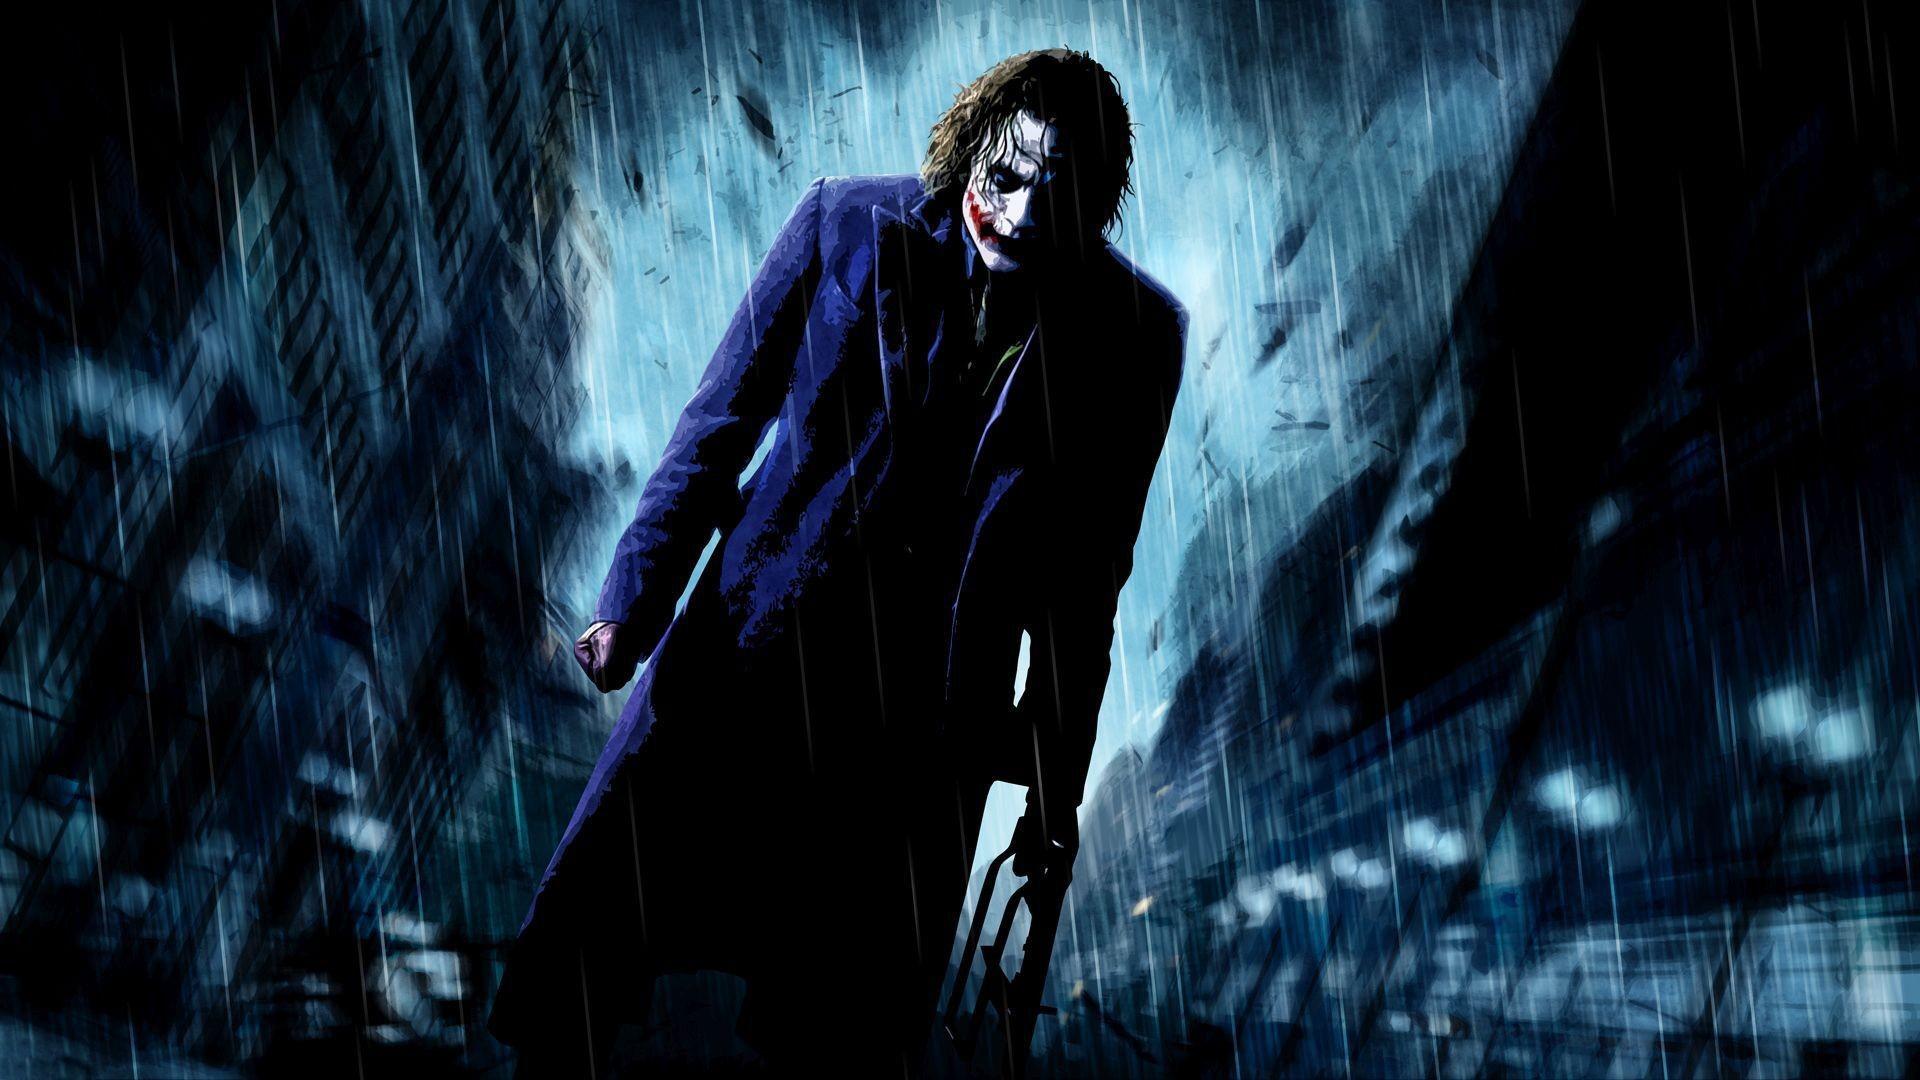 1920x1080 Abstract Fan Art Heath Ledger Movies The Dark Knight Joker